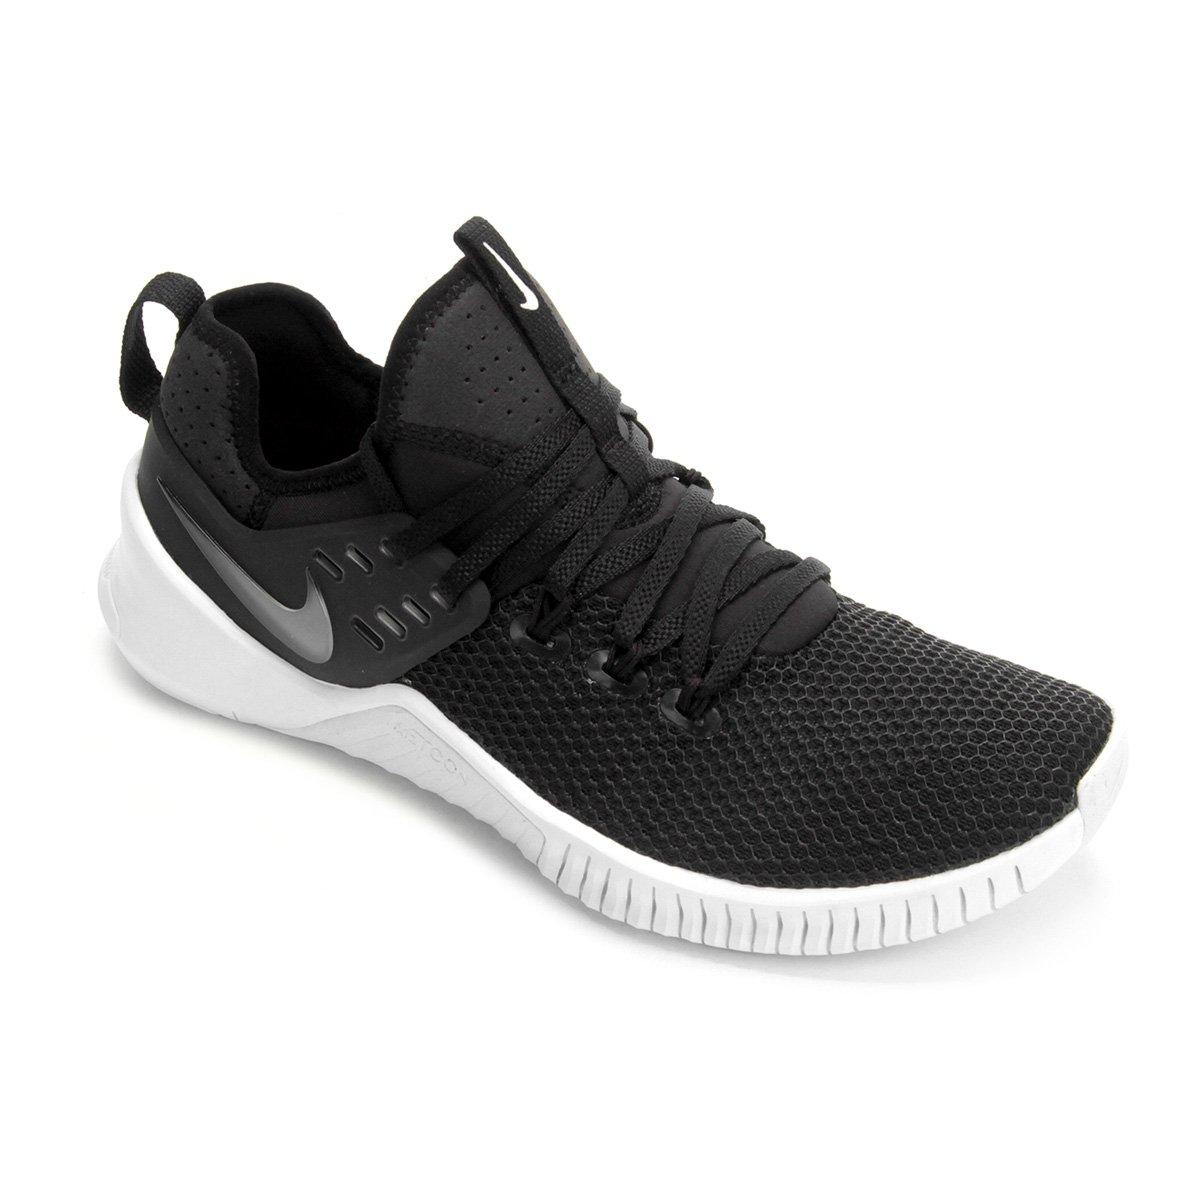 efbe832549c Tênis Nike Free Metcon Masculino